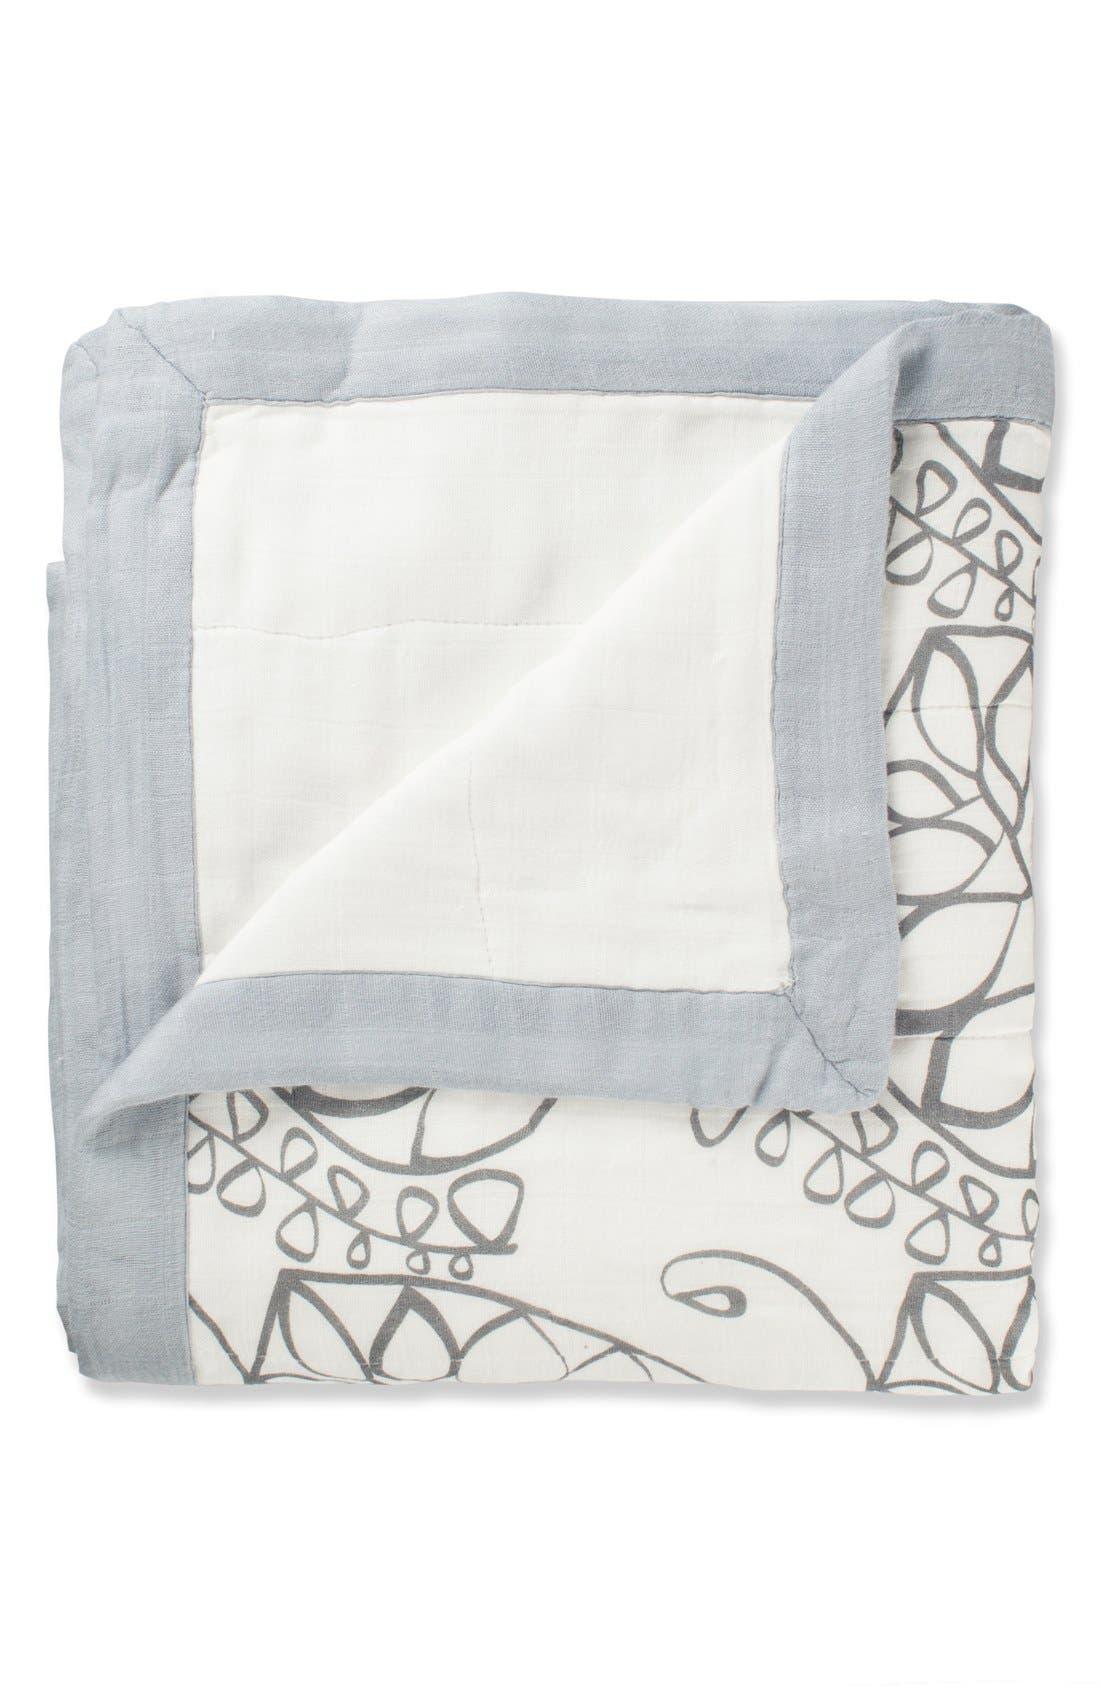 Alternate Image 1 Selected - aden + anais 'Dream' Blanket